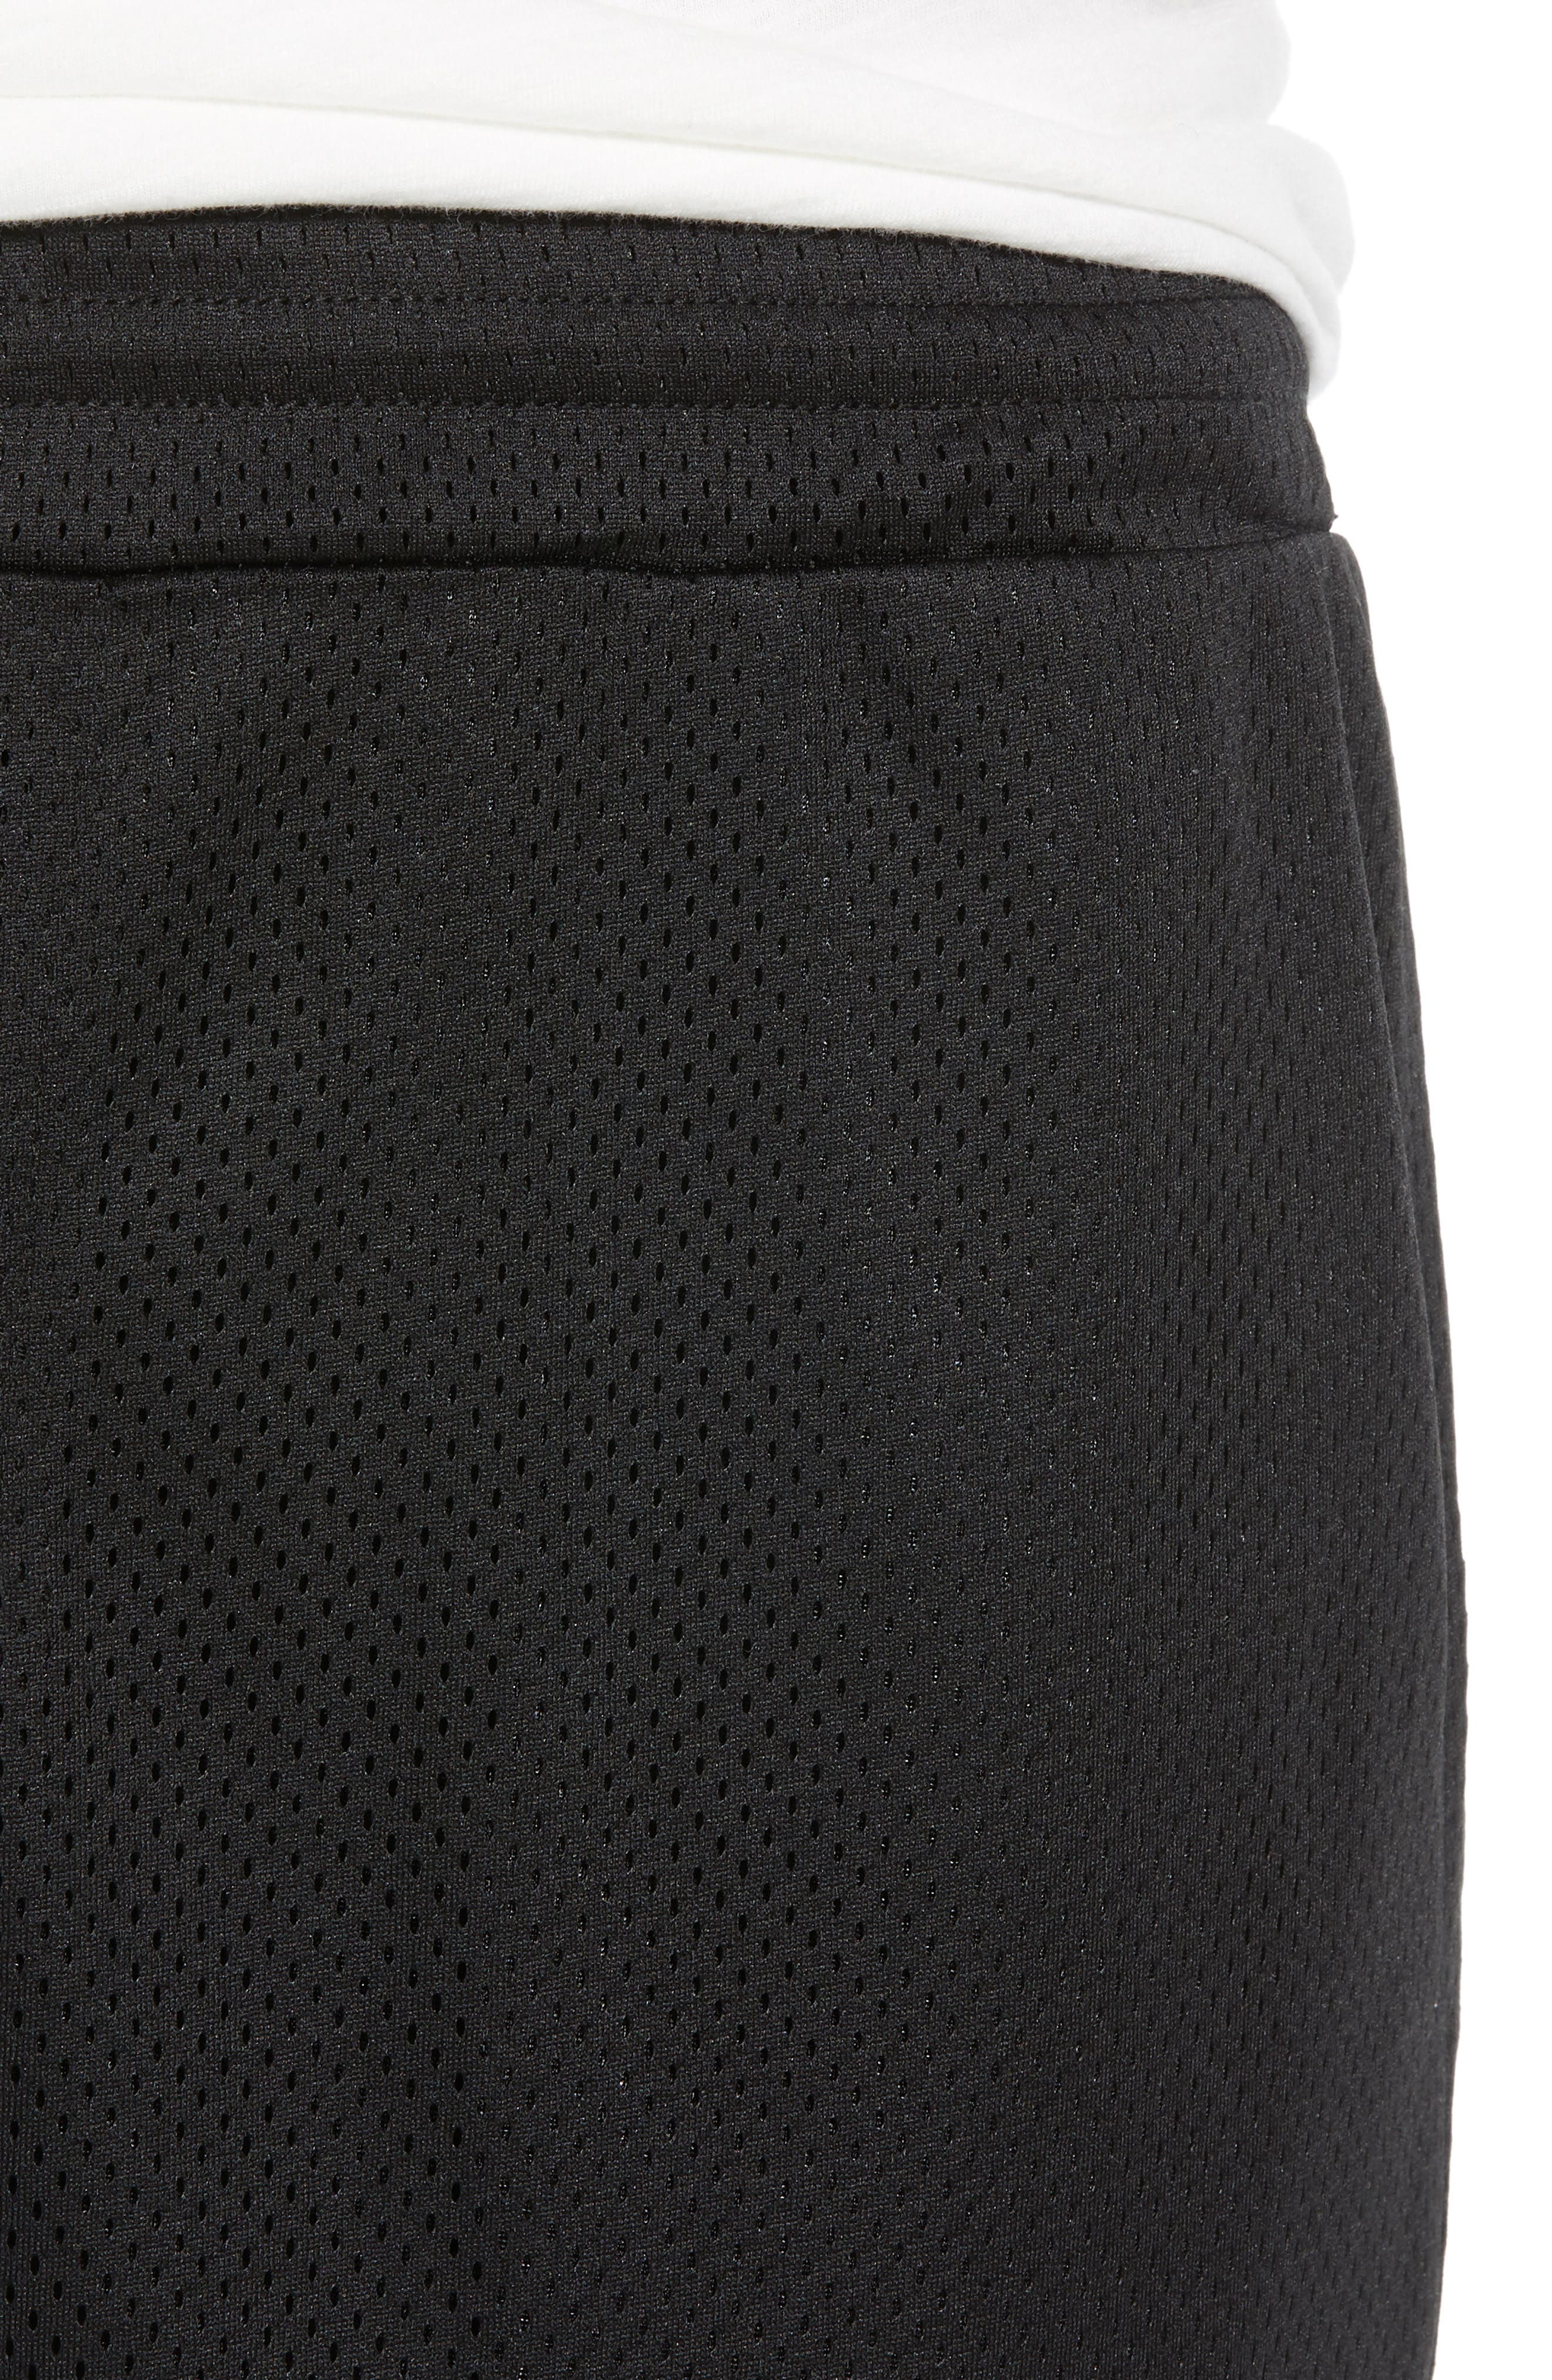 Basketball Shorts,                             Alternate thumbnail 4, color,                             001